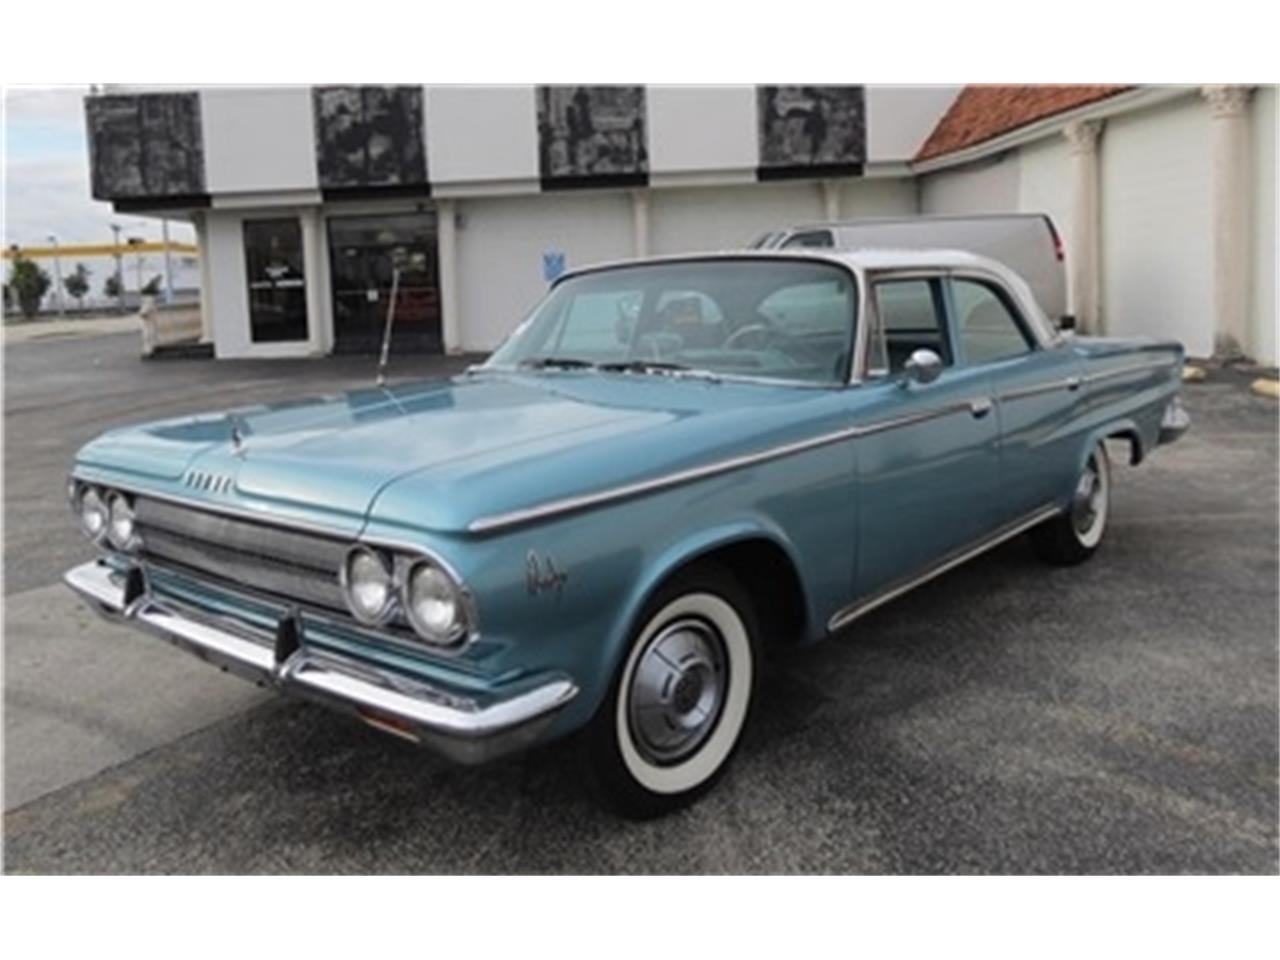 Red 1963 Dodge Custom 880 For Sale | MCG Marketplace